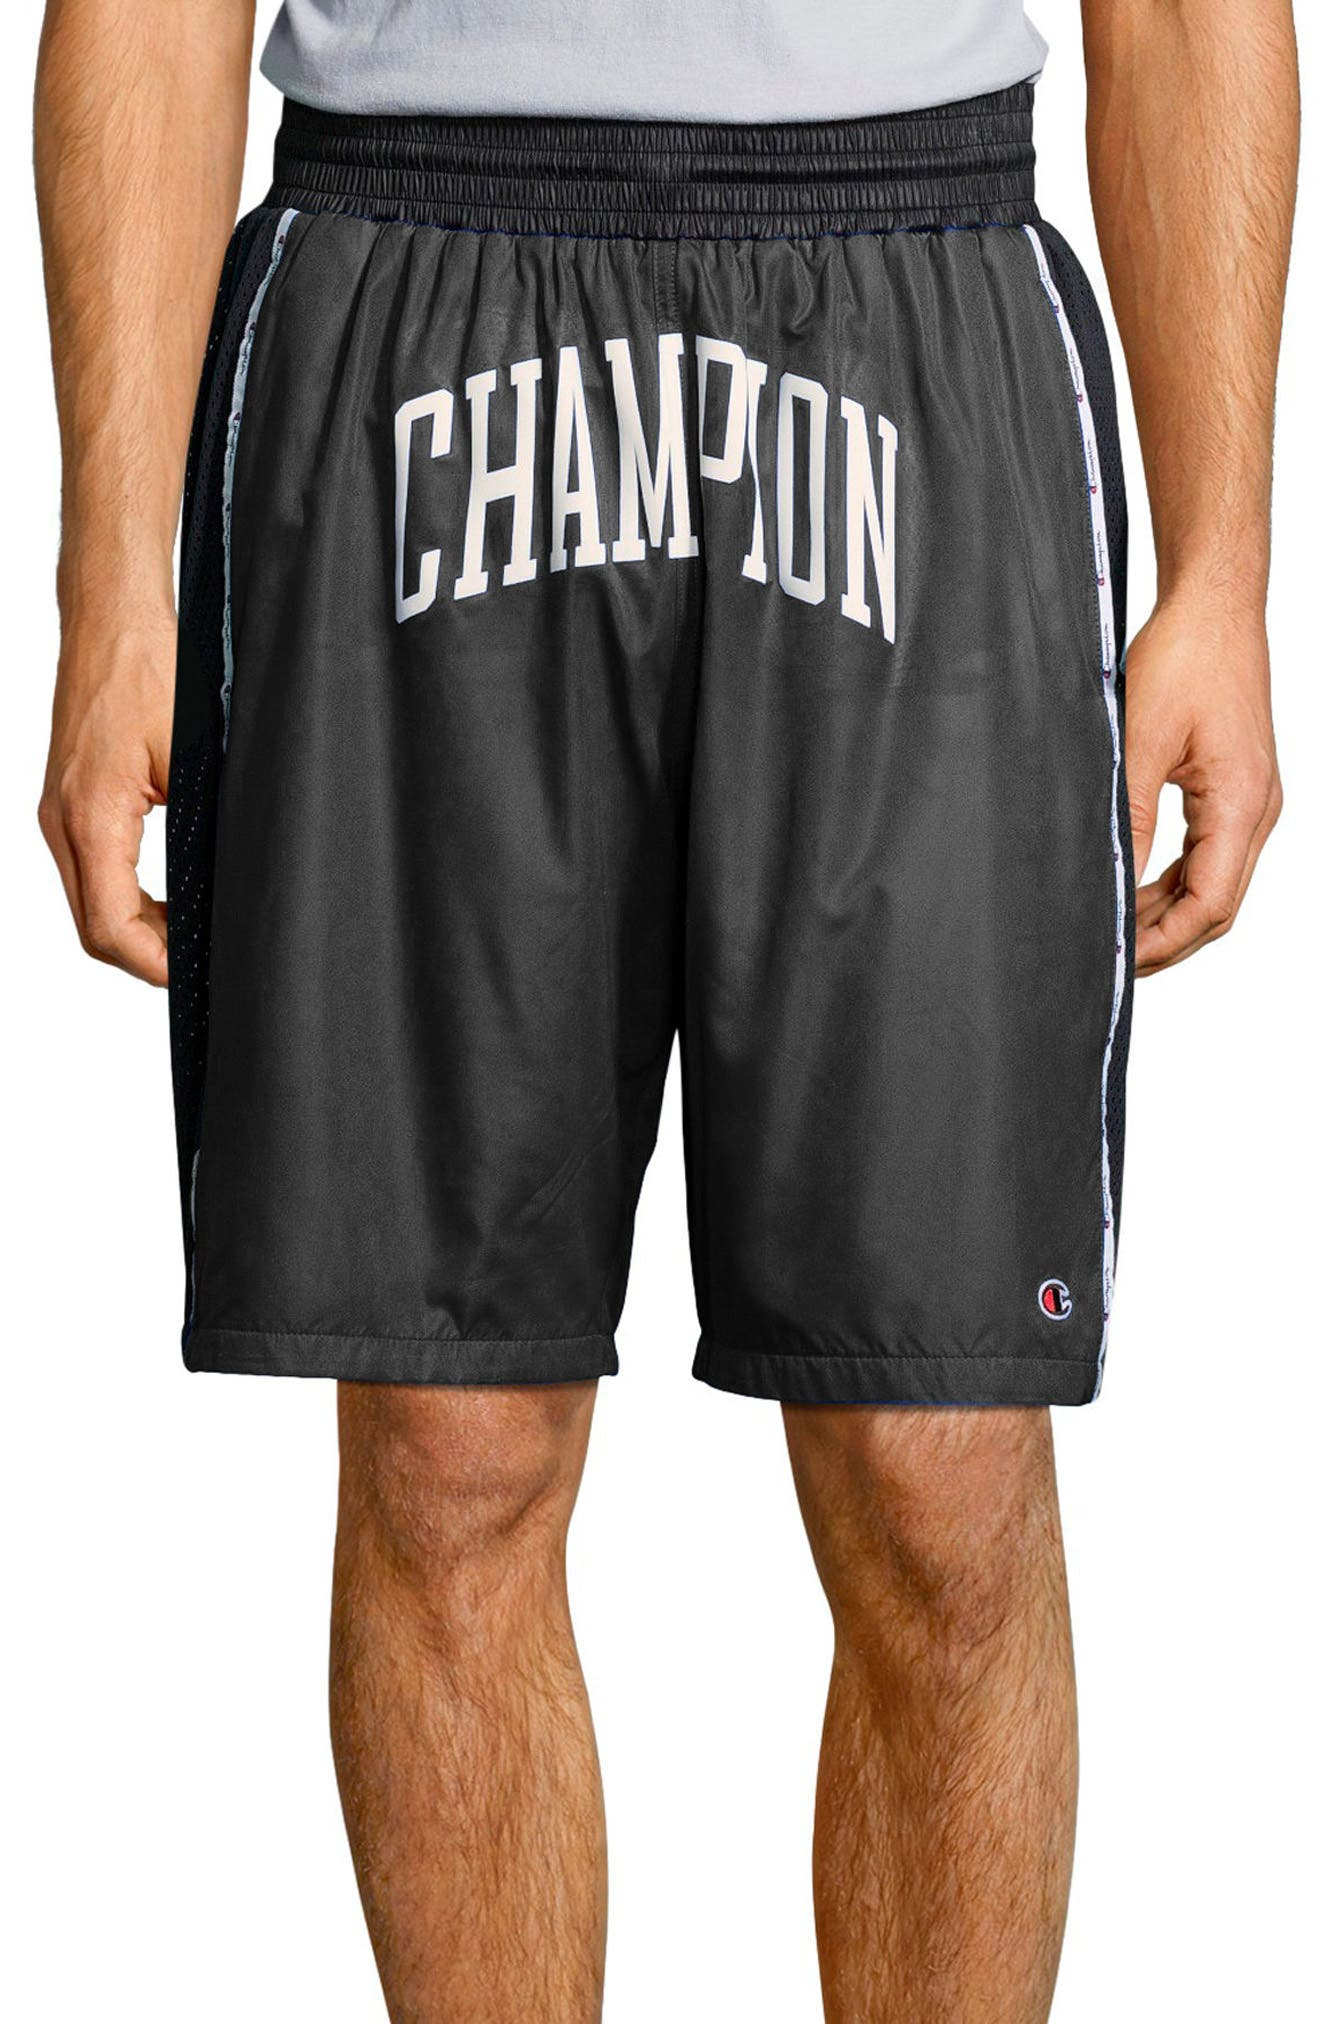 Champion Satin Shorts